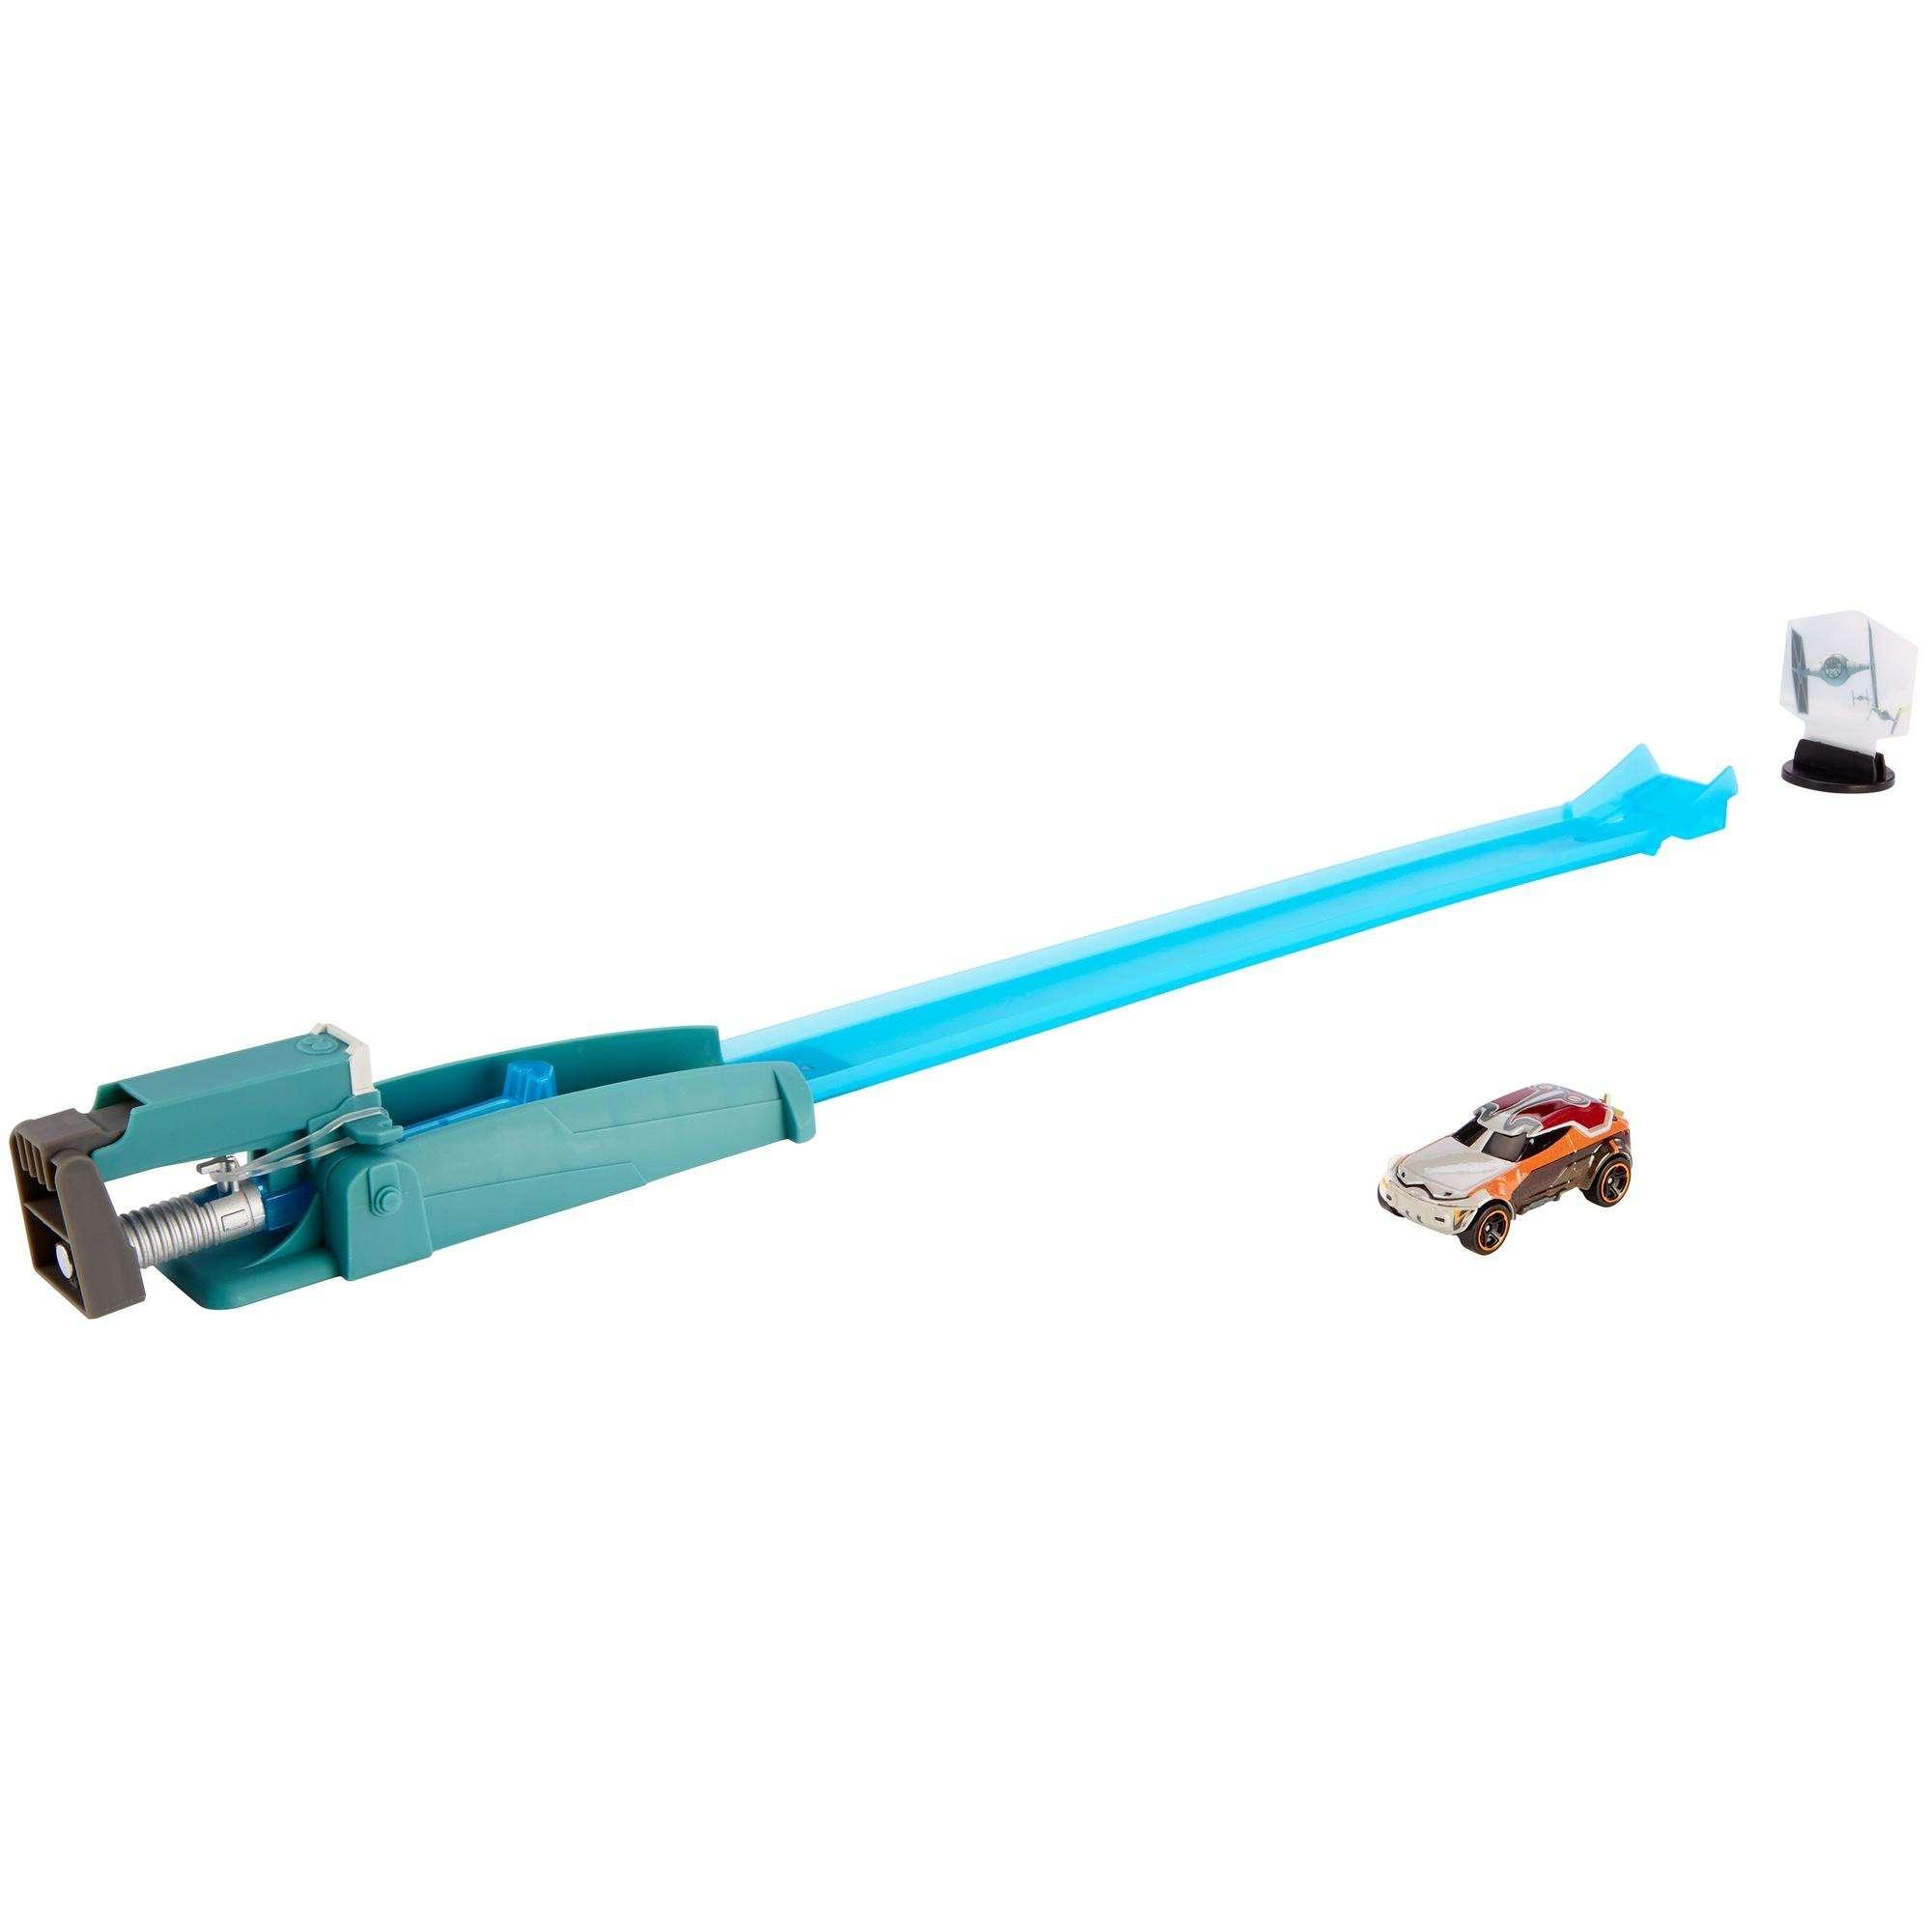 RO (SWR) Hot Wheels Blast & Battle Lightsaber Launcher Set 2